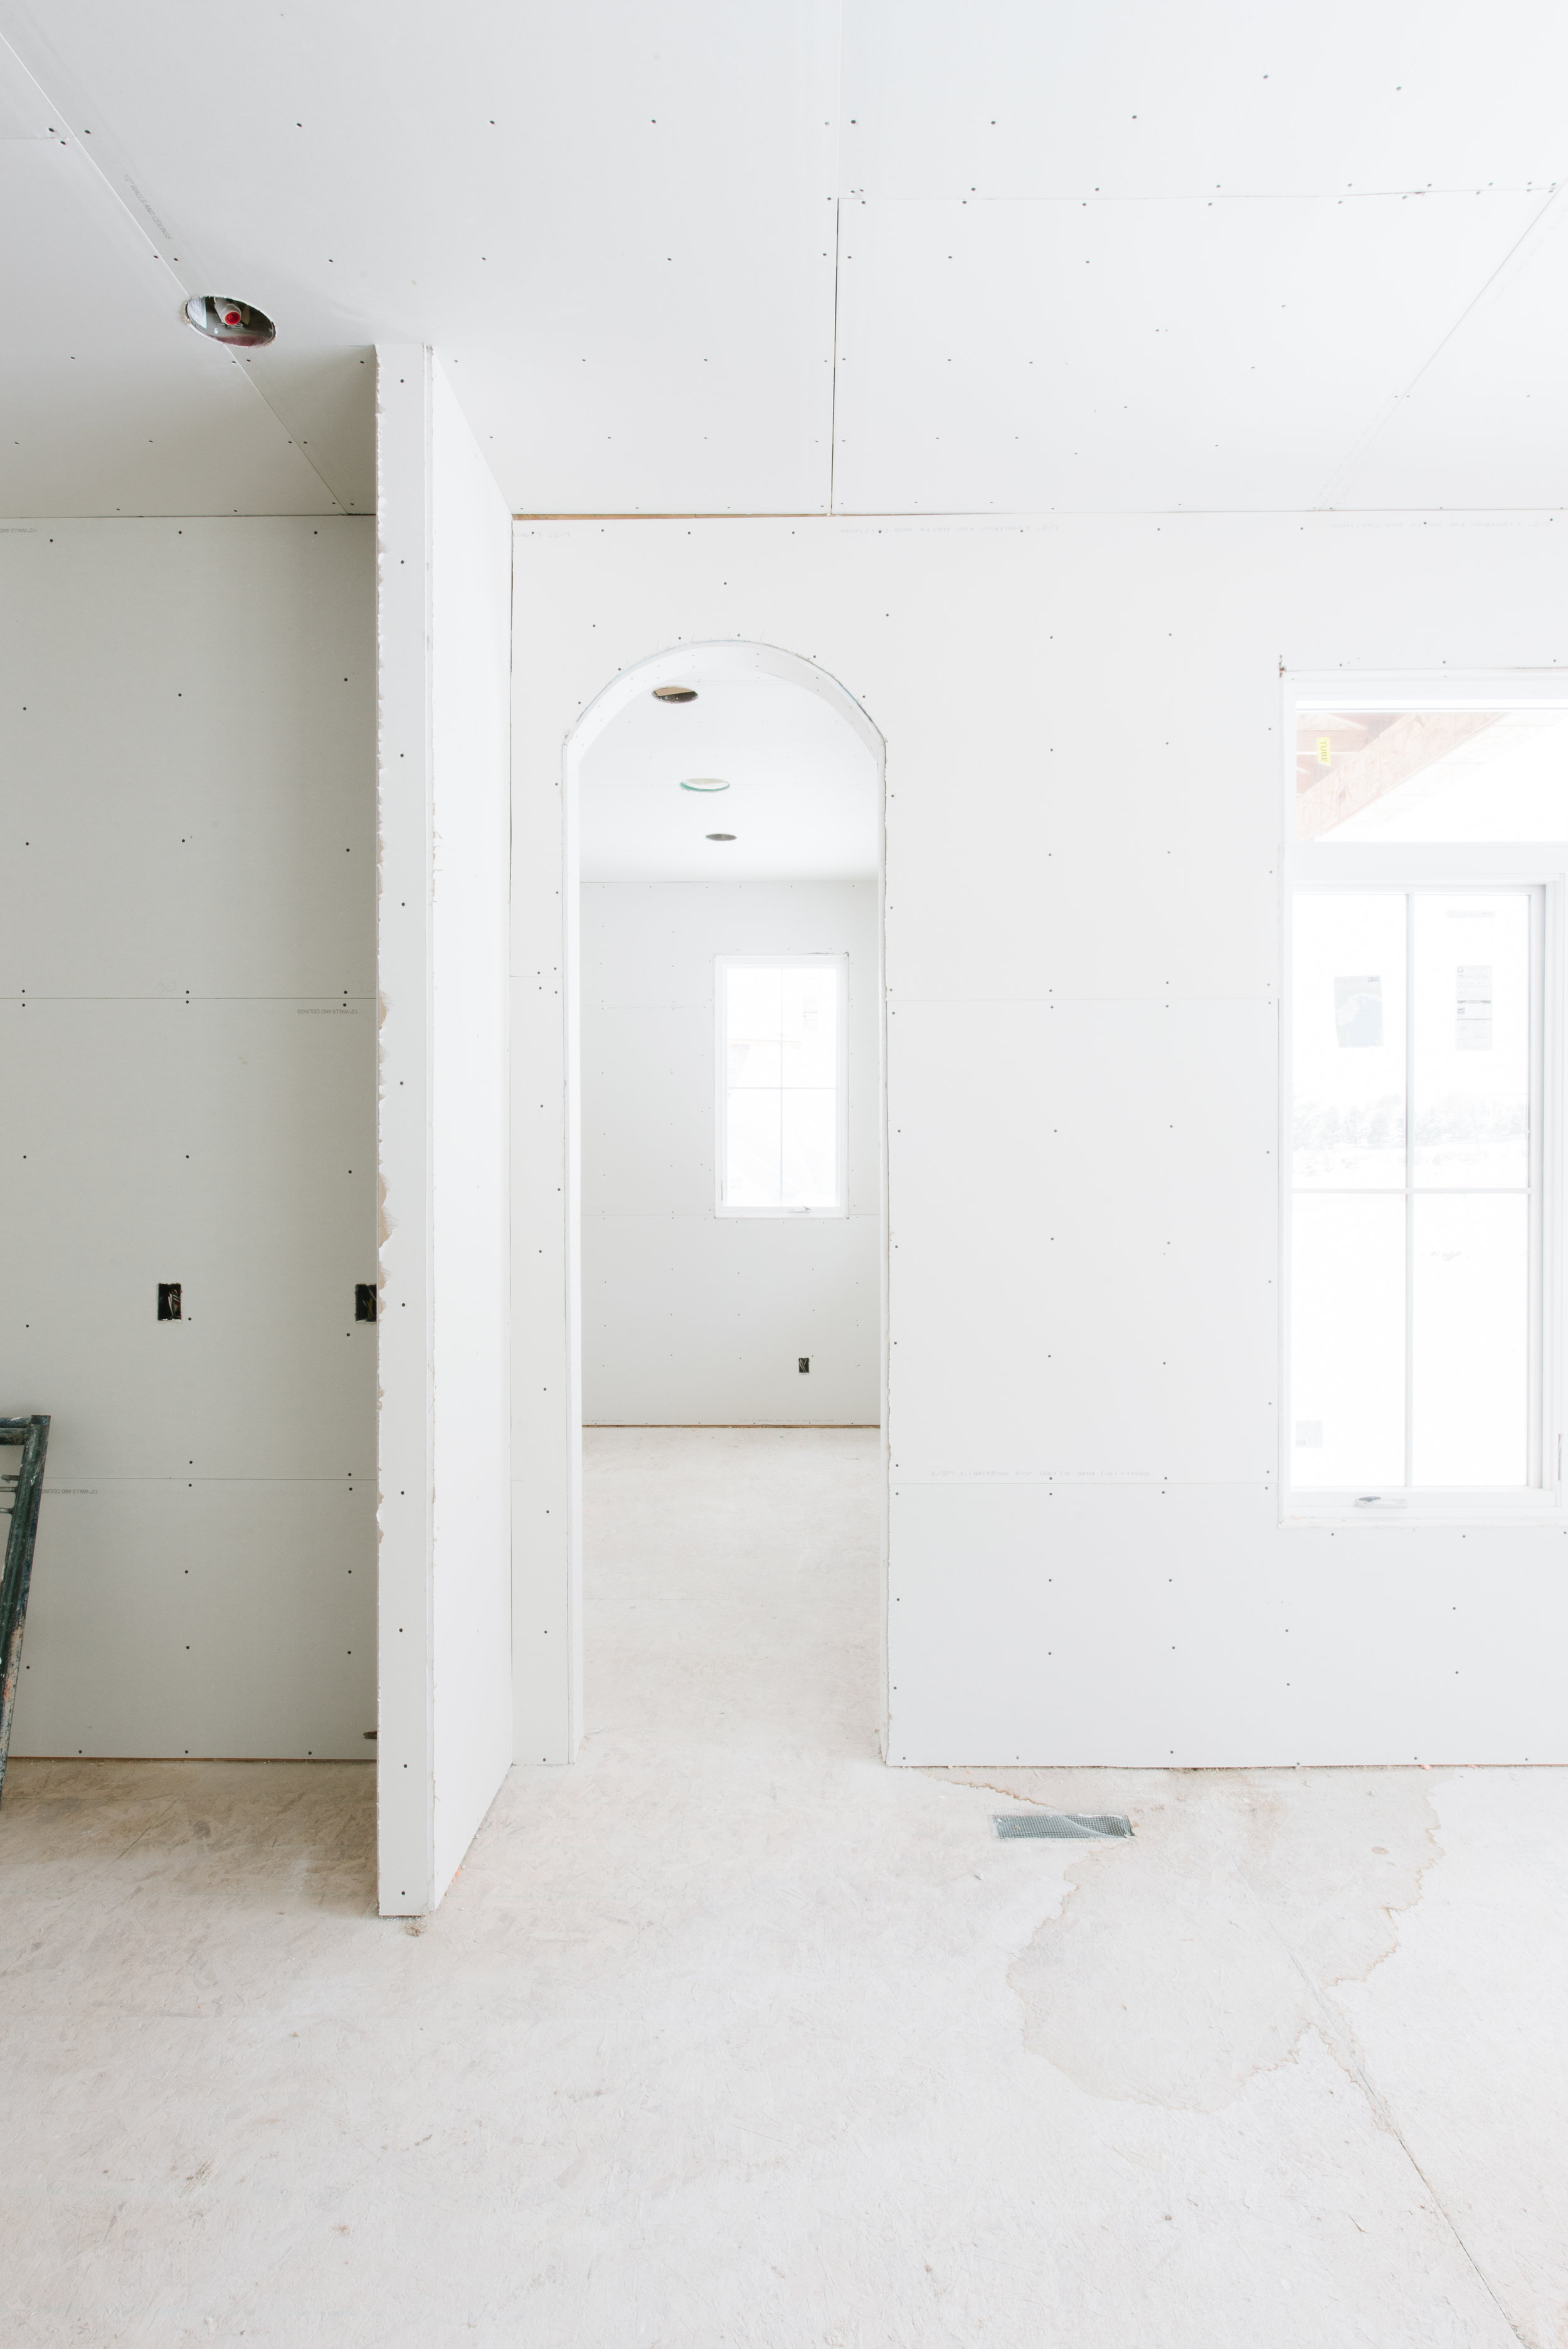 LOOKING TOWARDS KIDS' HOMEWORK / CRAFT ROOM